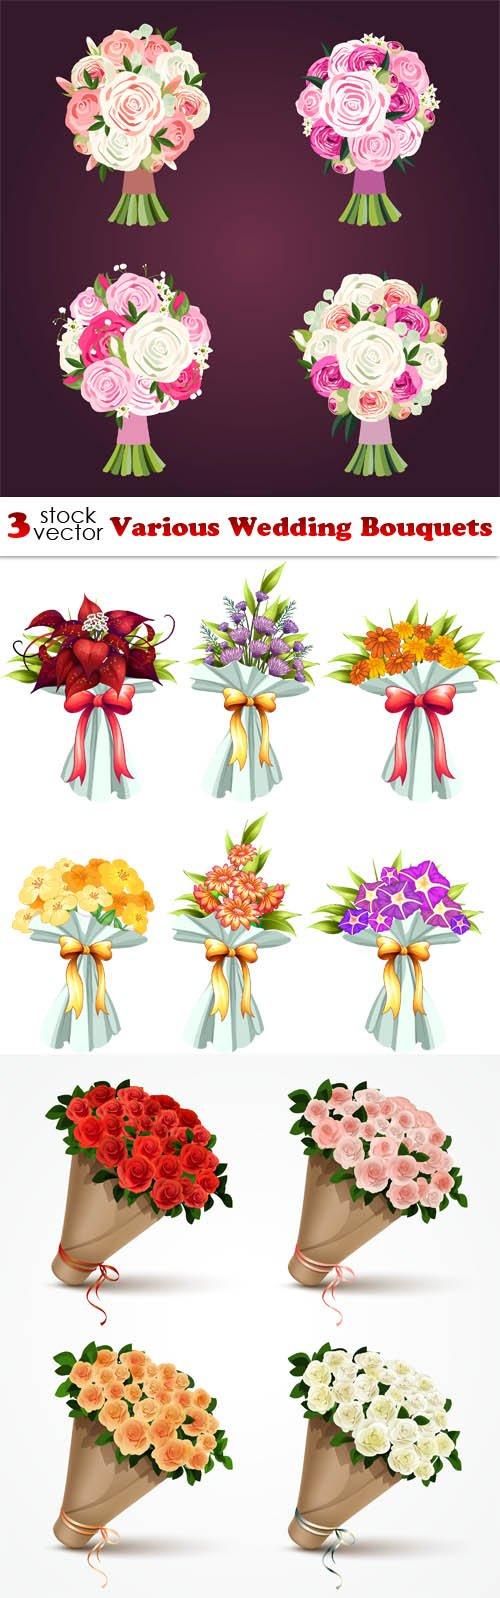 Vectors - Various Wedding Bouquets